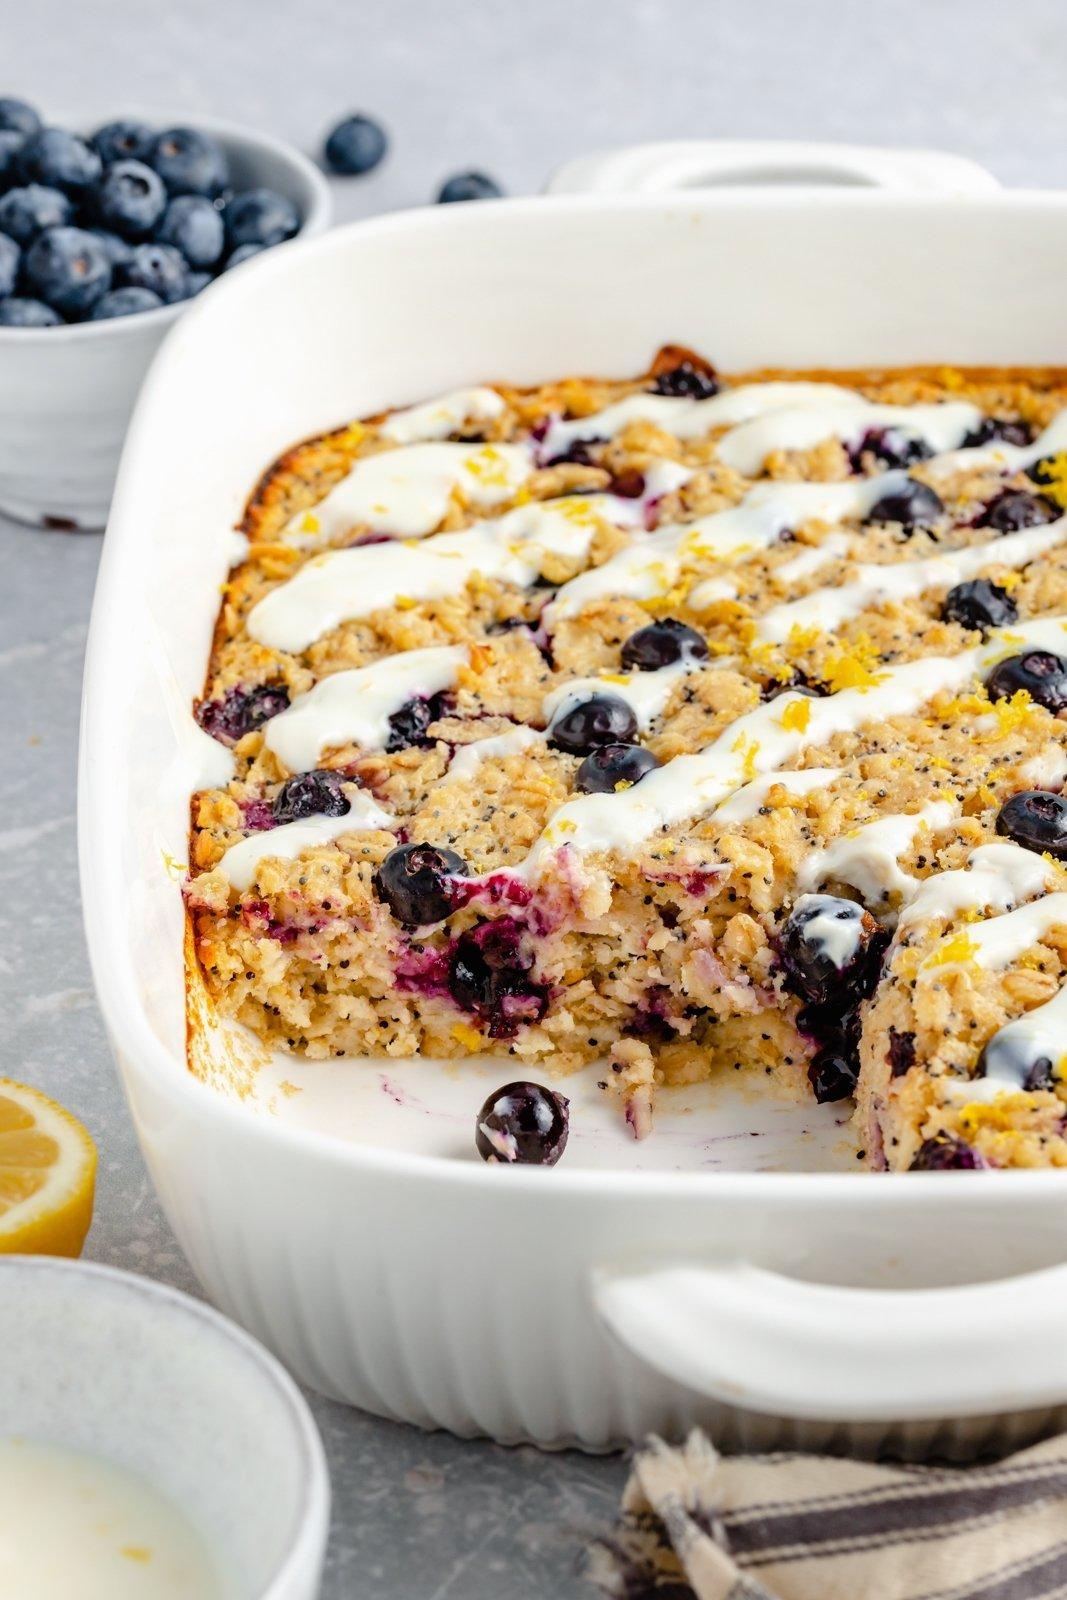 lemon blueberry baked oatmeal in a baking dish